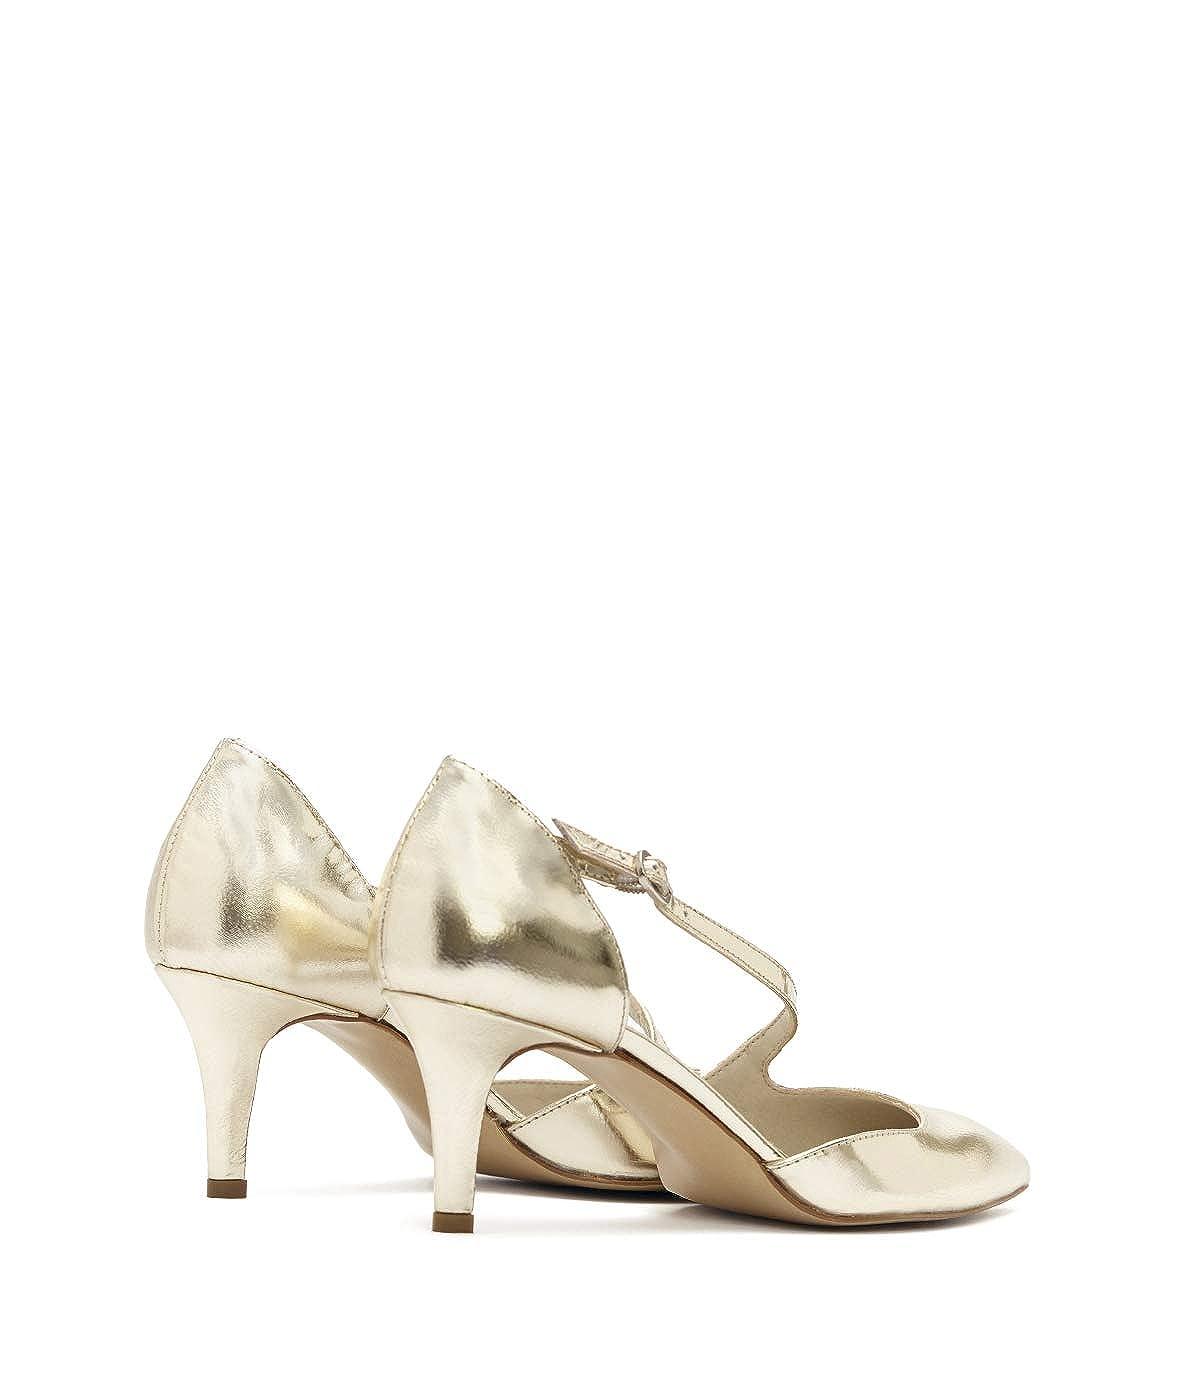 Poi Lei Damen-Schuhe Jessica Riemchen Pumps Jessica Damen-Schuhe PlatinGold Stiletto Leder eecc23